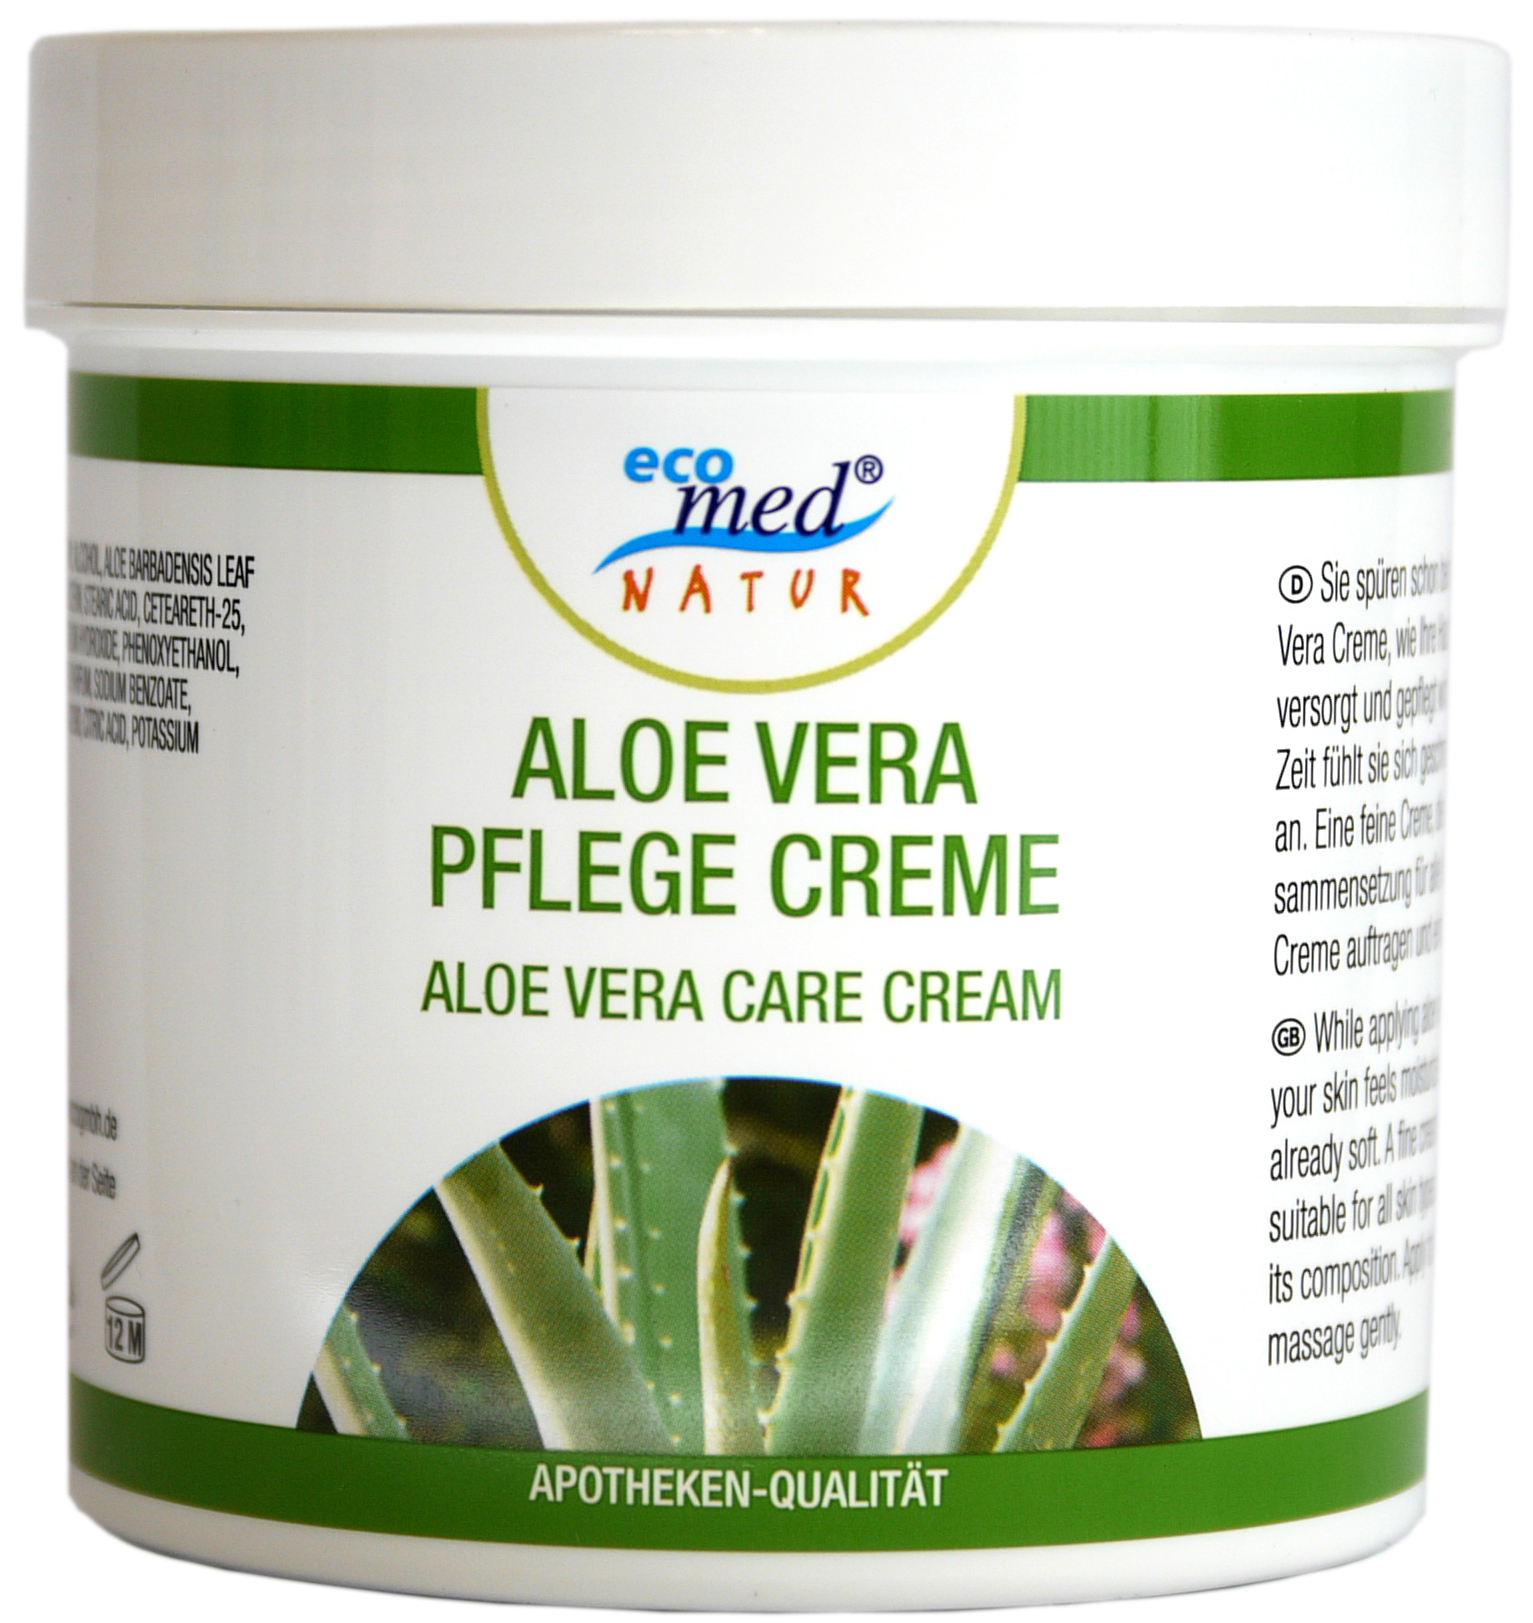 01840 - eco med Natur Aloe Vera Pflege Creme 250 ml